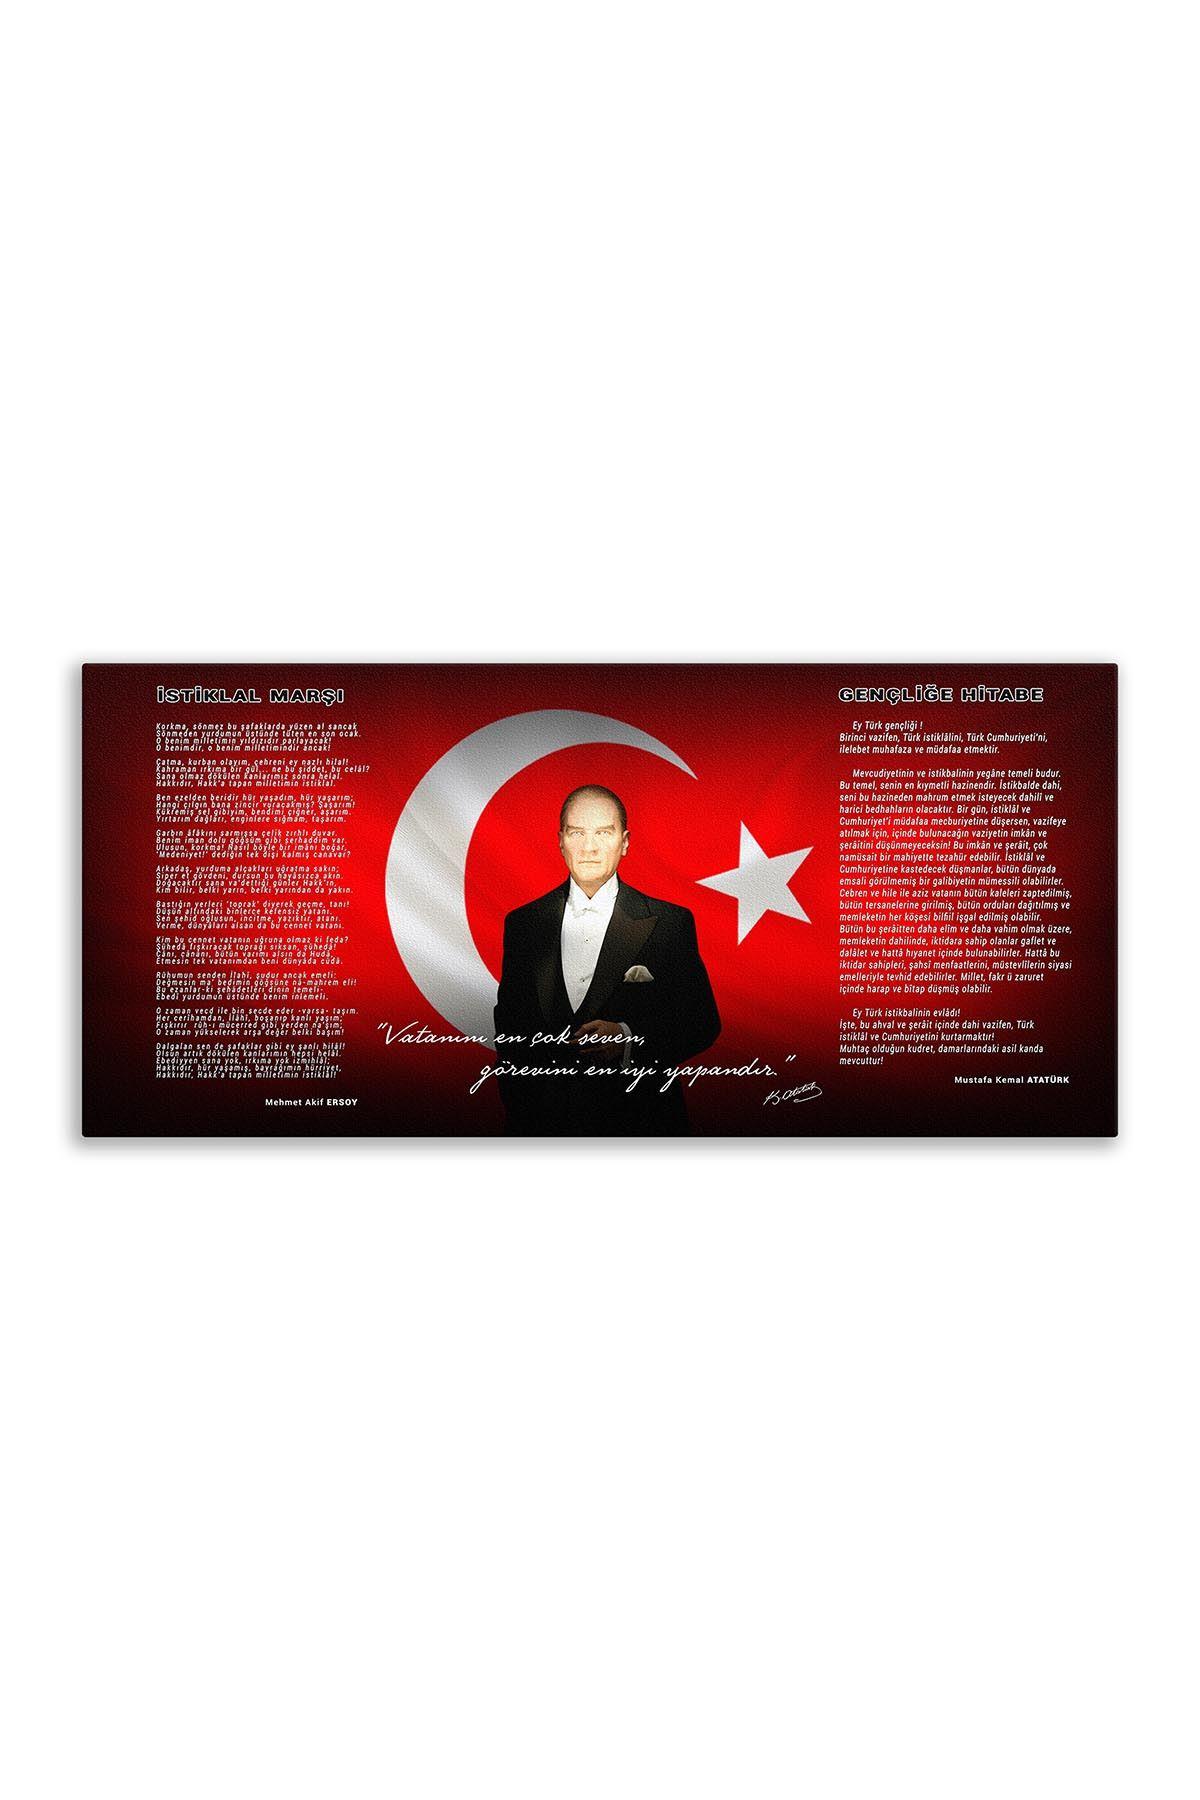 Atatürk Canvas Board With Turkish Flag | Printed Canvas Board | Digital Printing